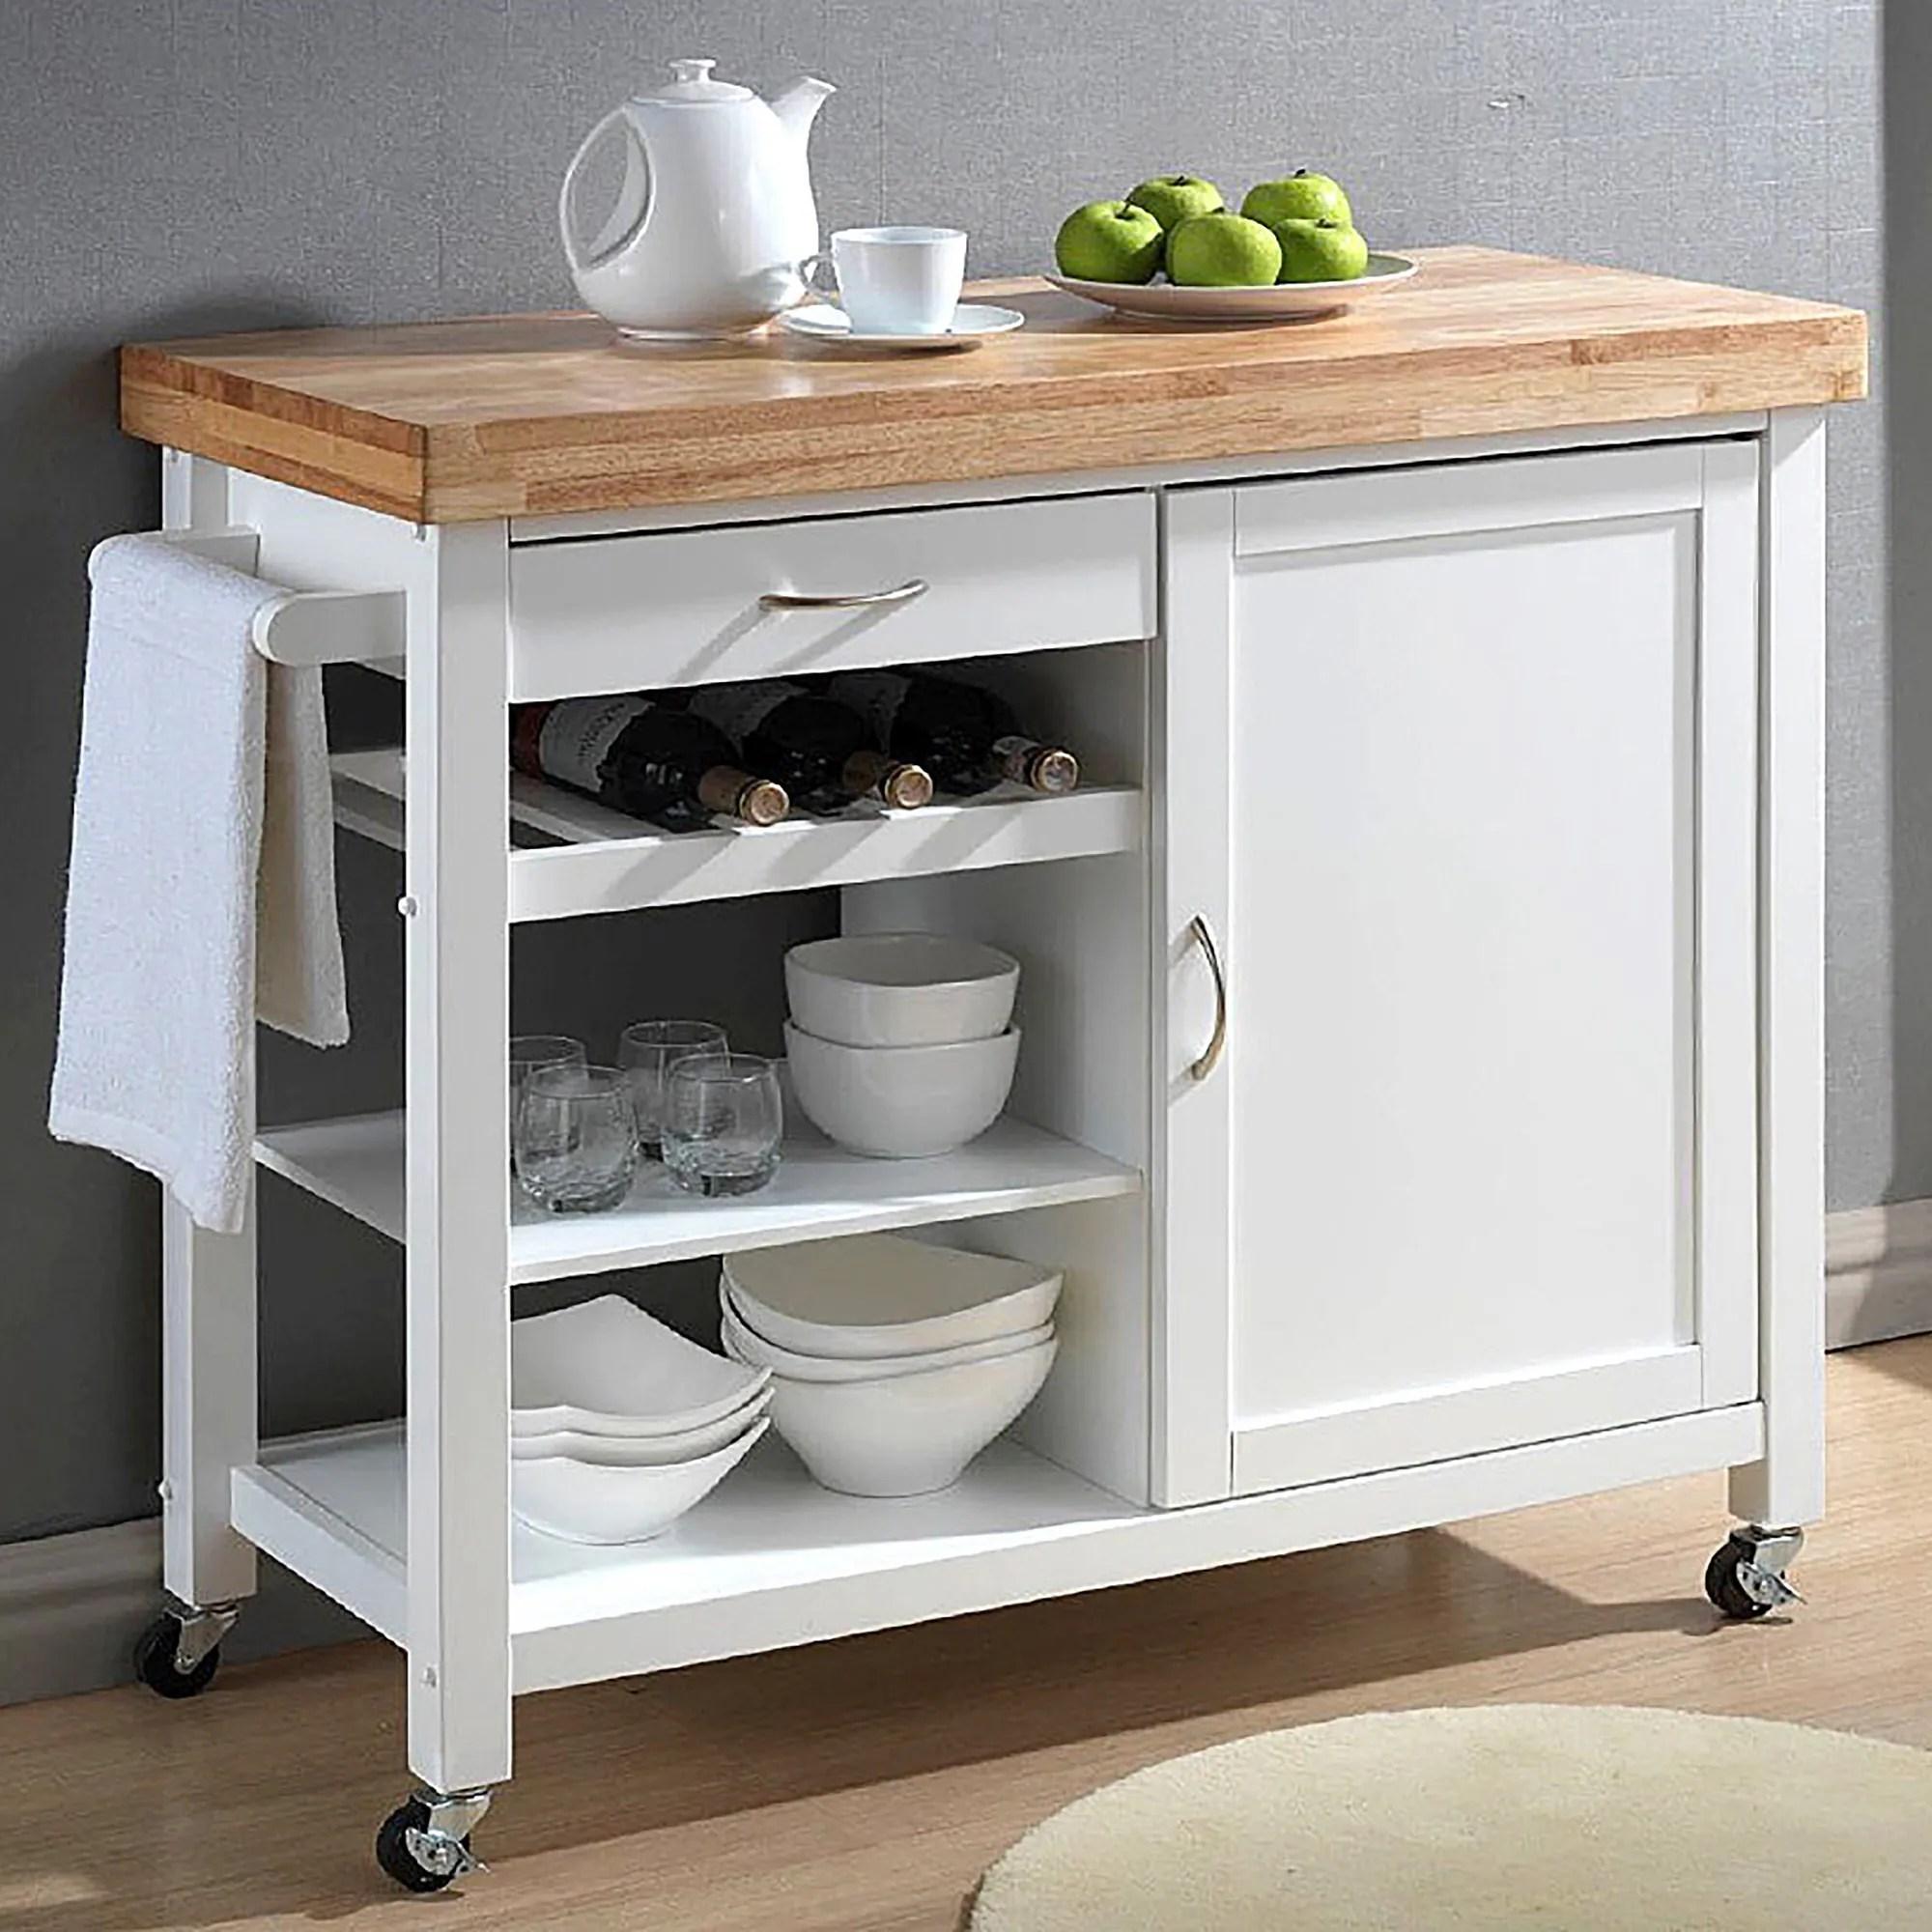 modern kitchen cart trailer shop denver white free shipping today